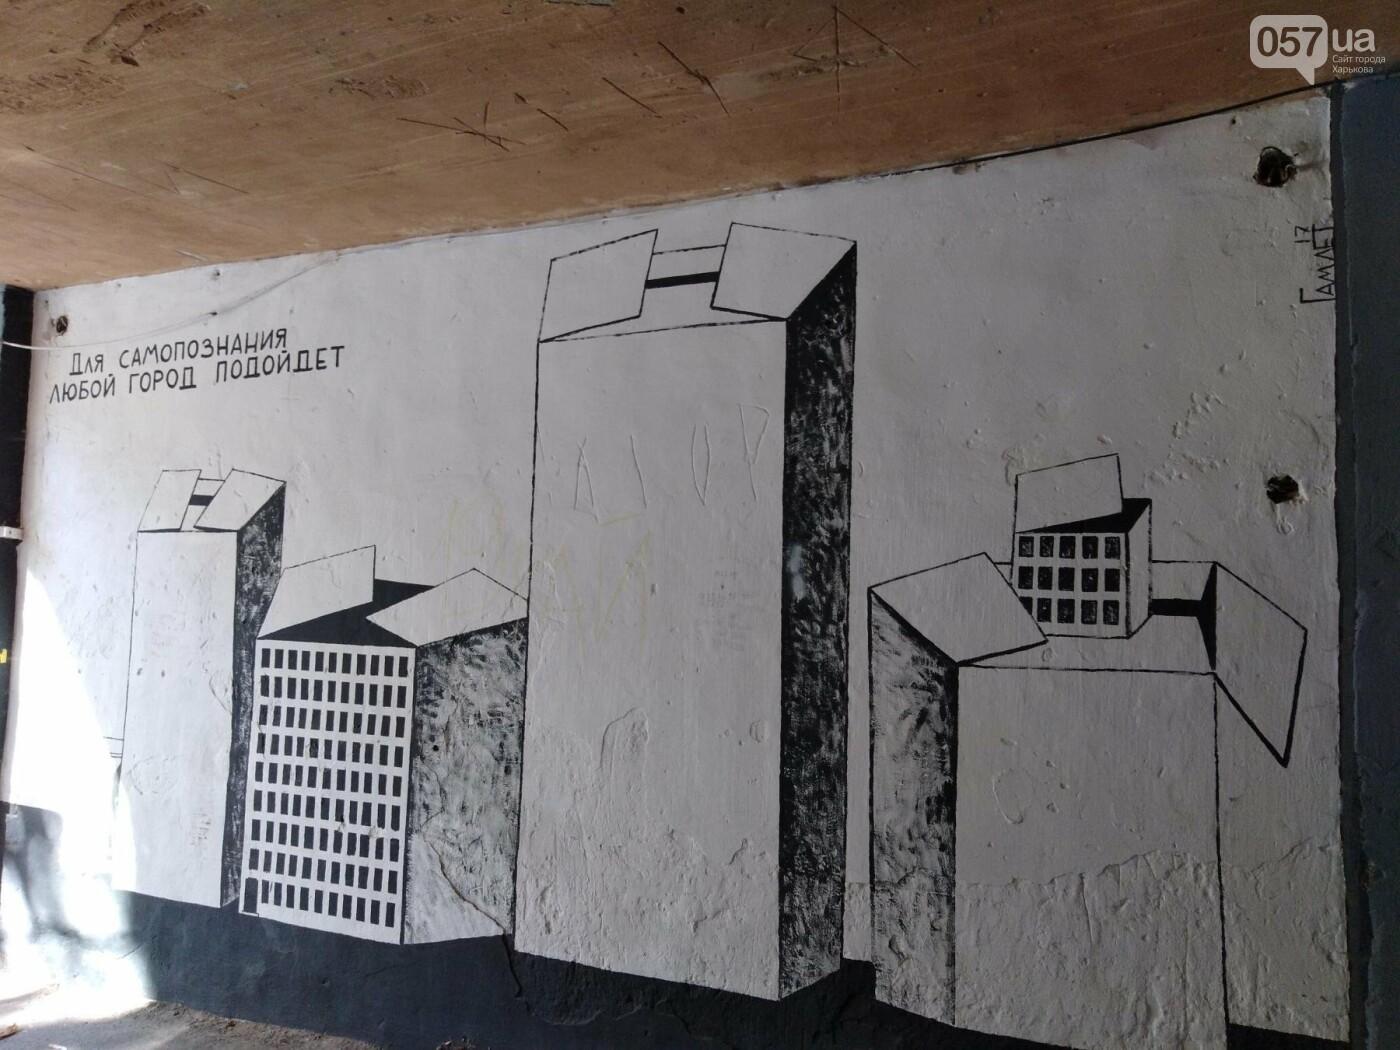 Стрит-арт Гамлета в Харькове: ТОП-10 граффити художника, - ФОТО, фото-4